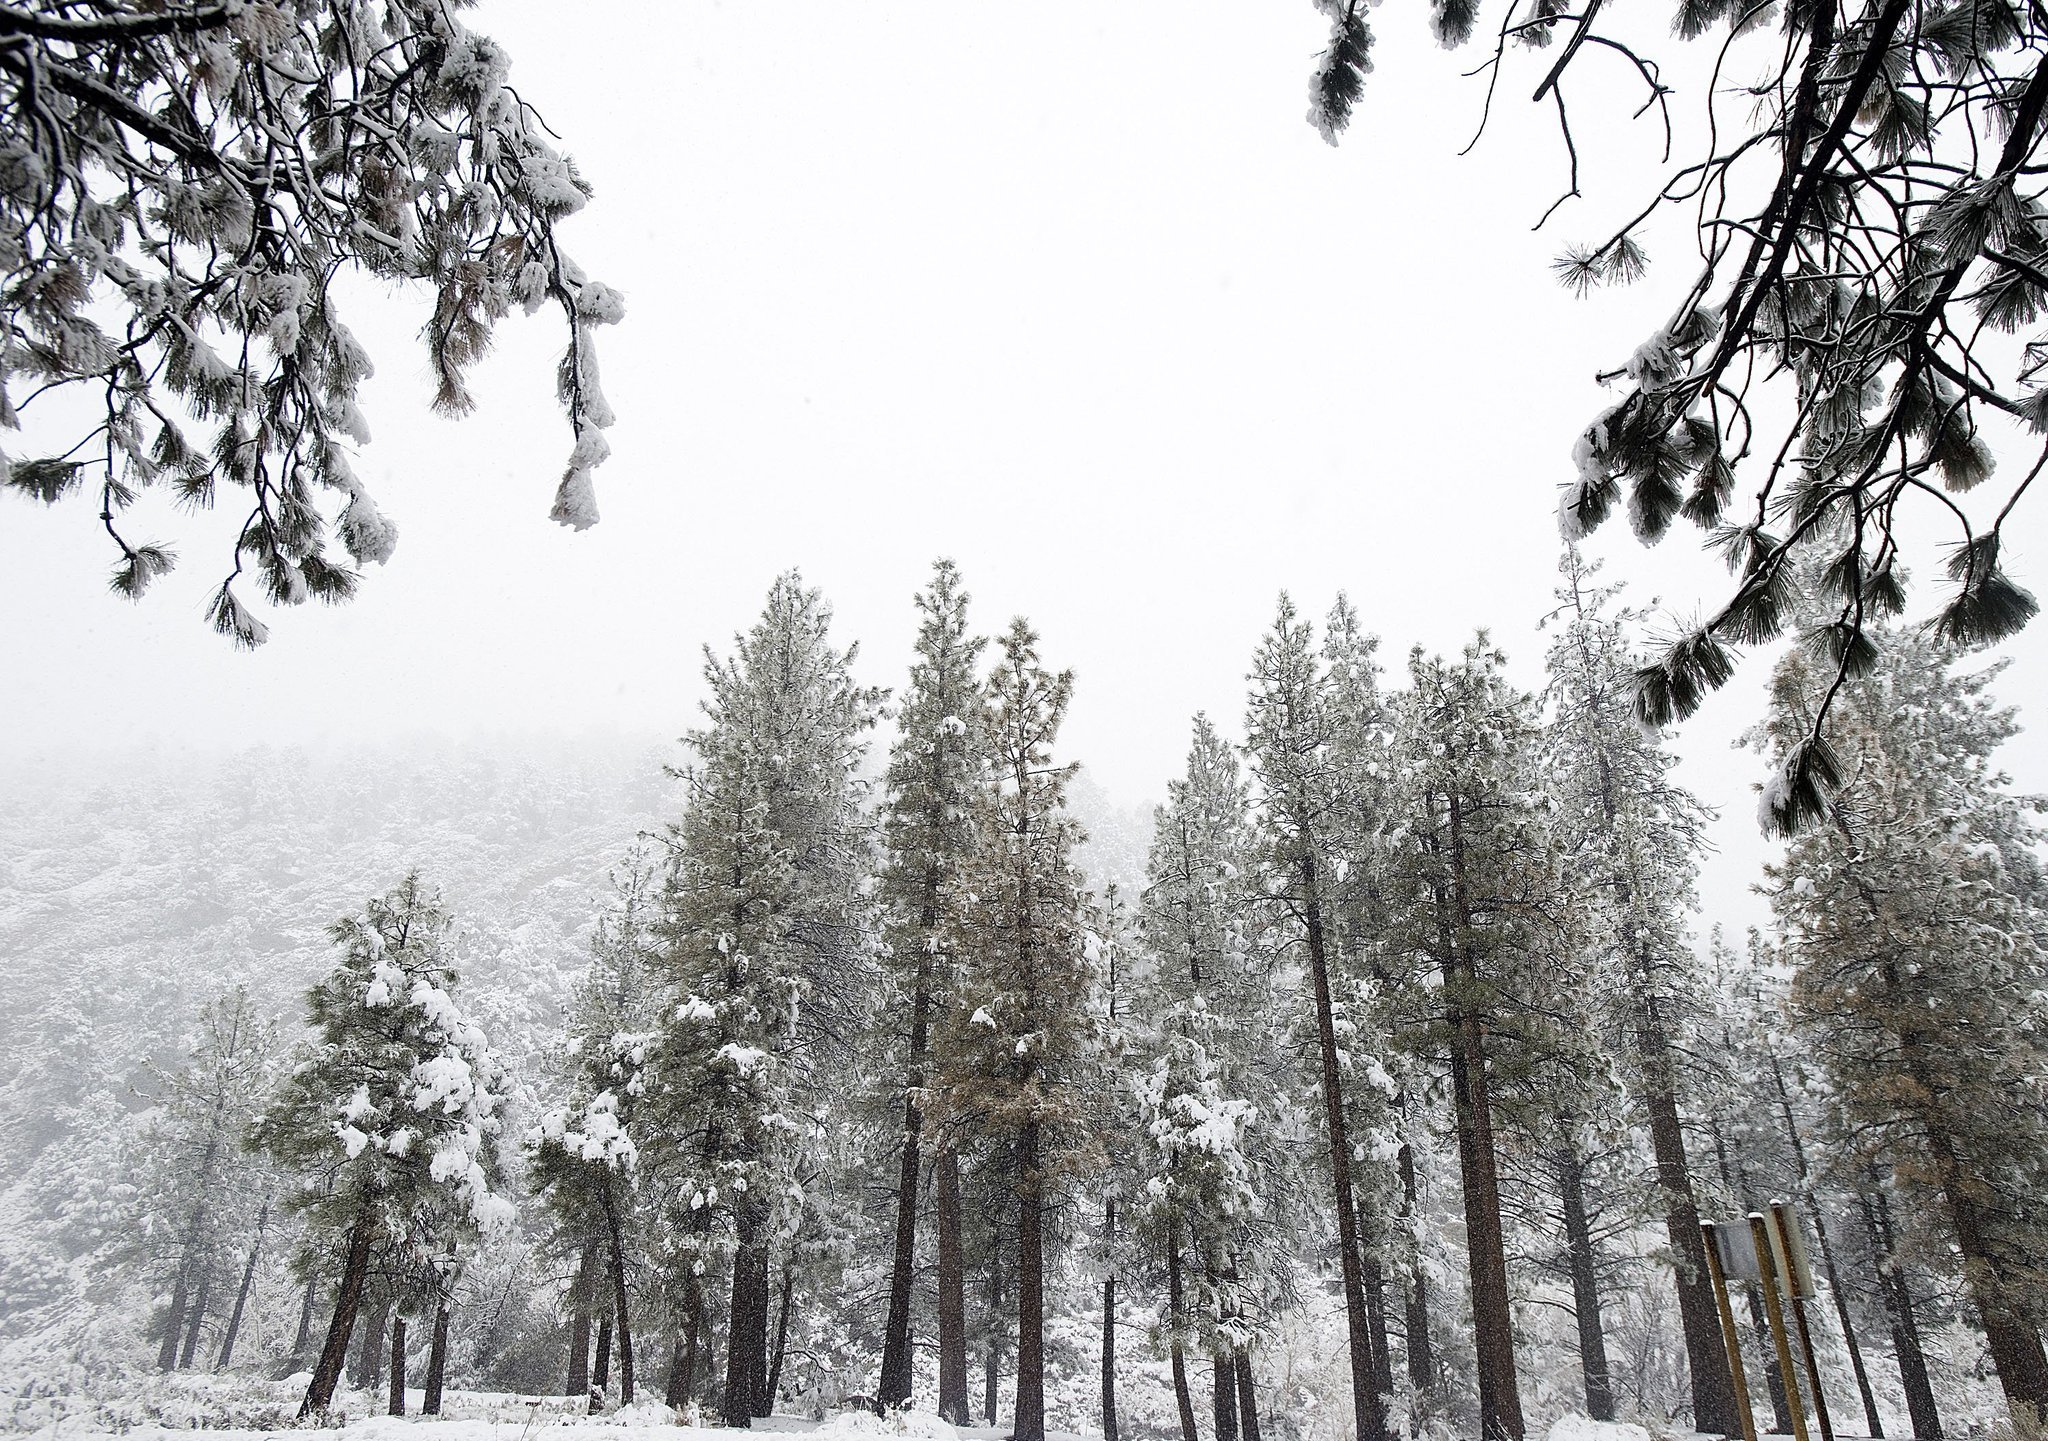 California Snow Story - One Good Summer EP